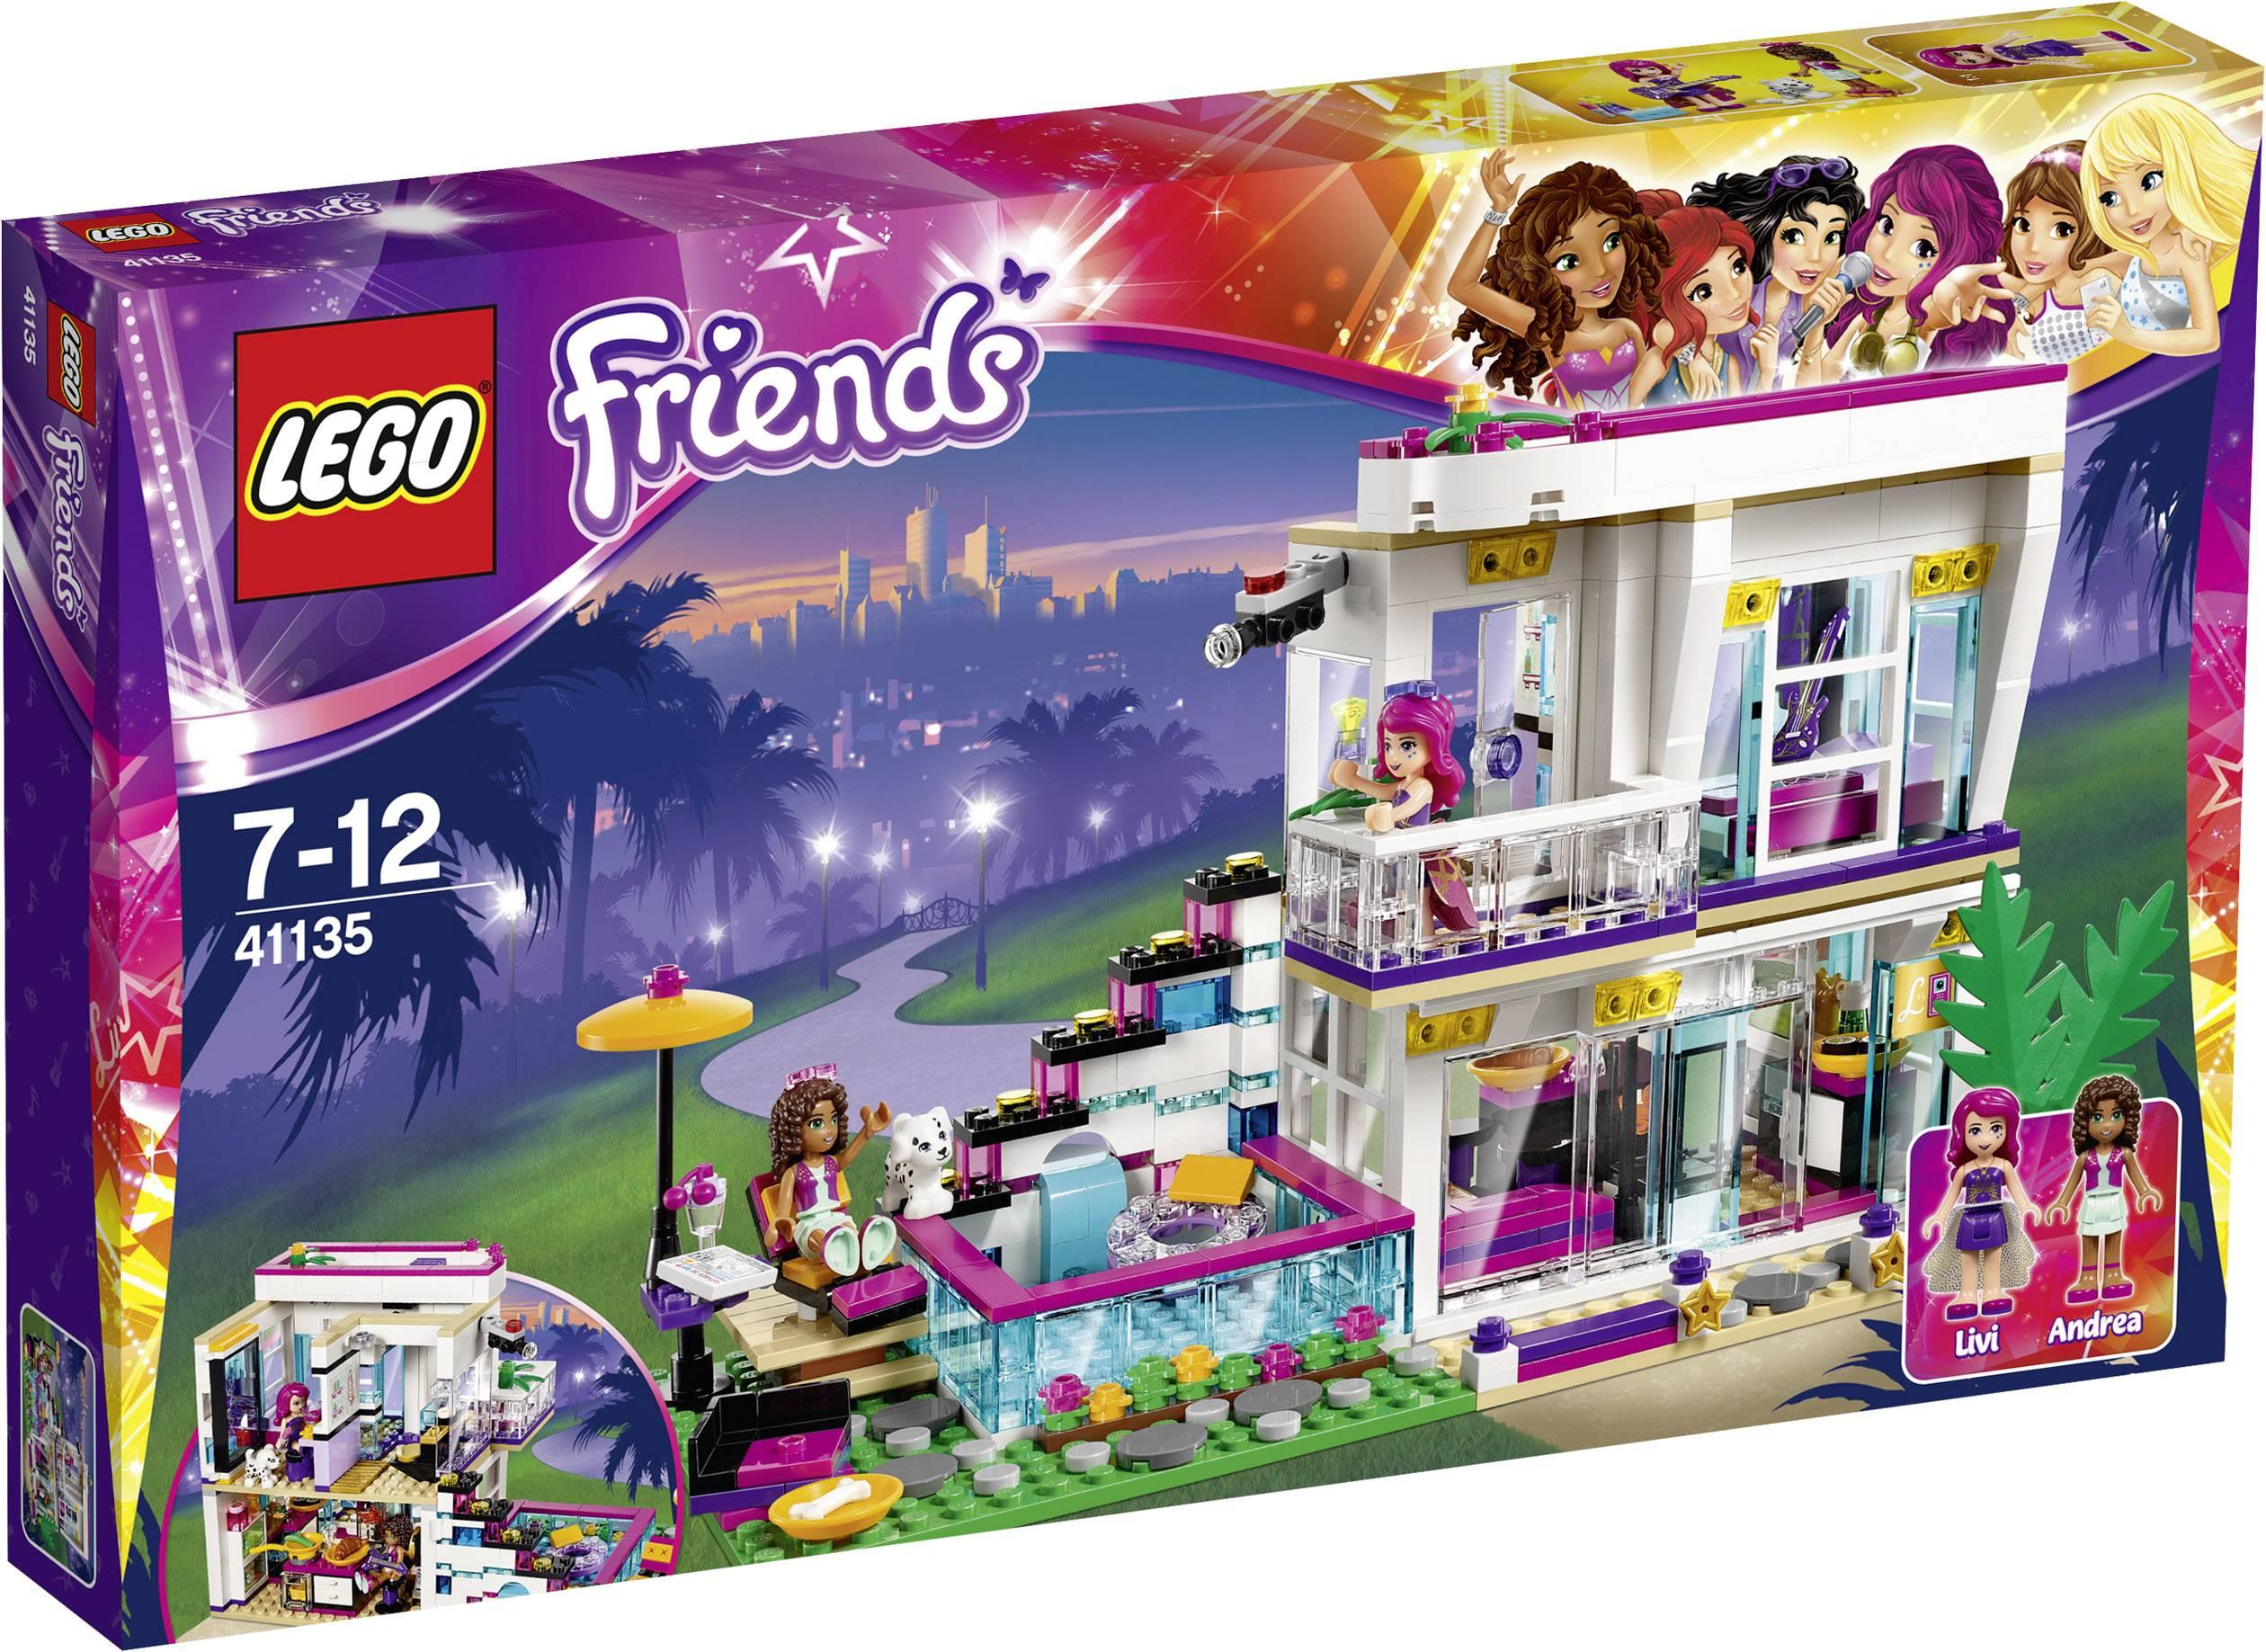 Lego friends livi s popsterrenhuis conrad